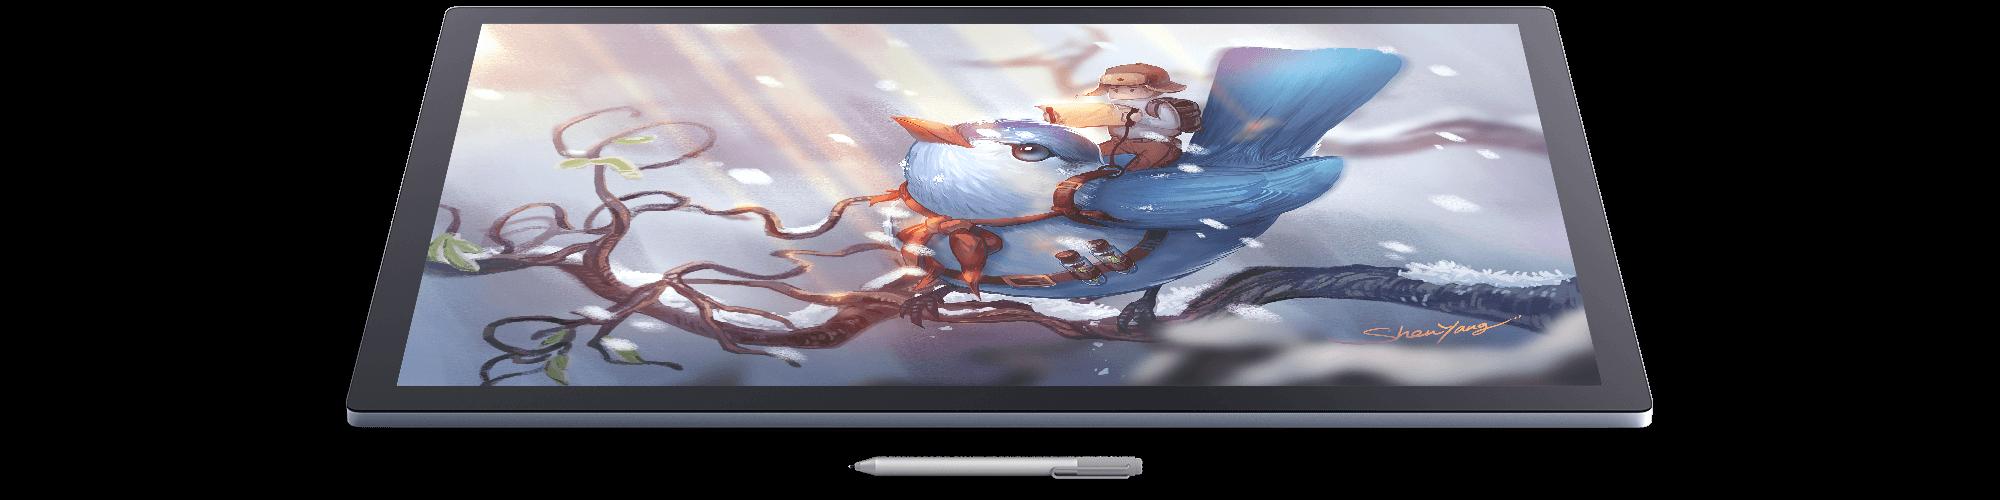 >SketchBook Pro 2021 v8.8.0 MAC&WIN – Autodesk最具创意的概念至艺术工具